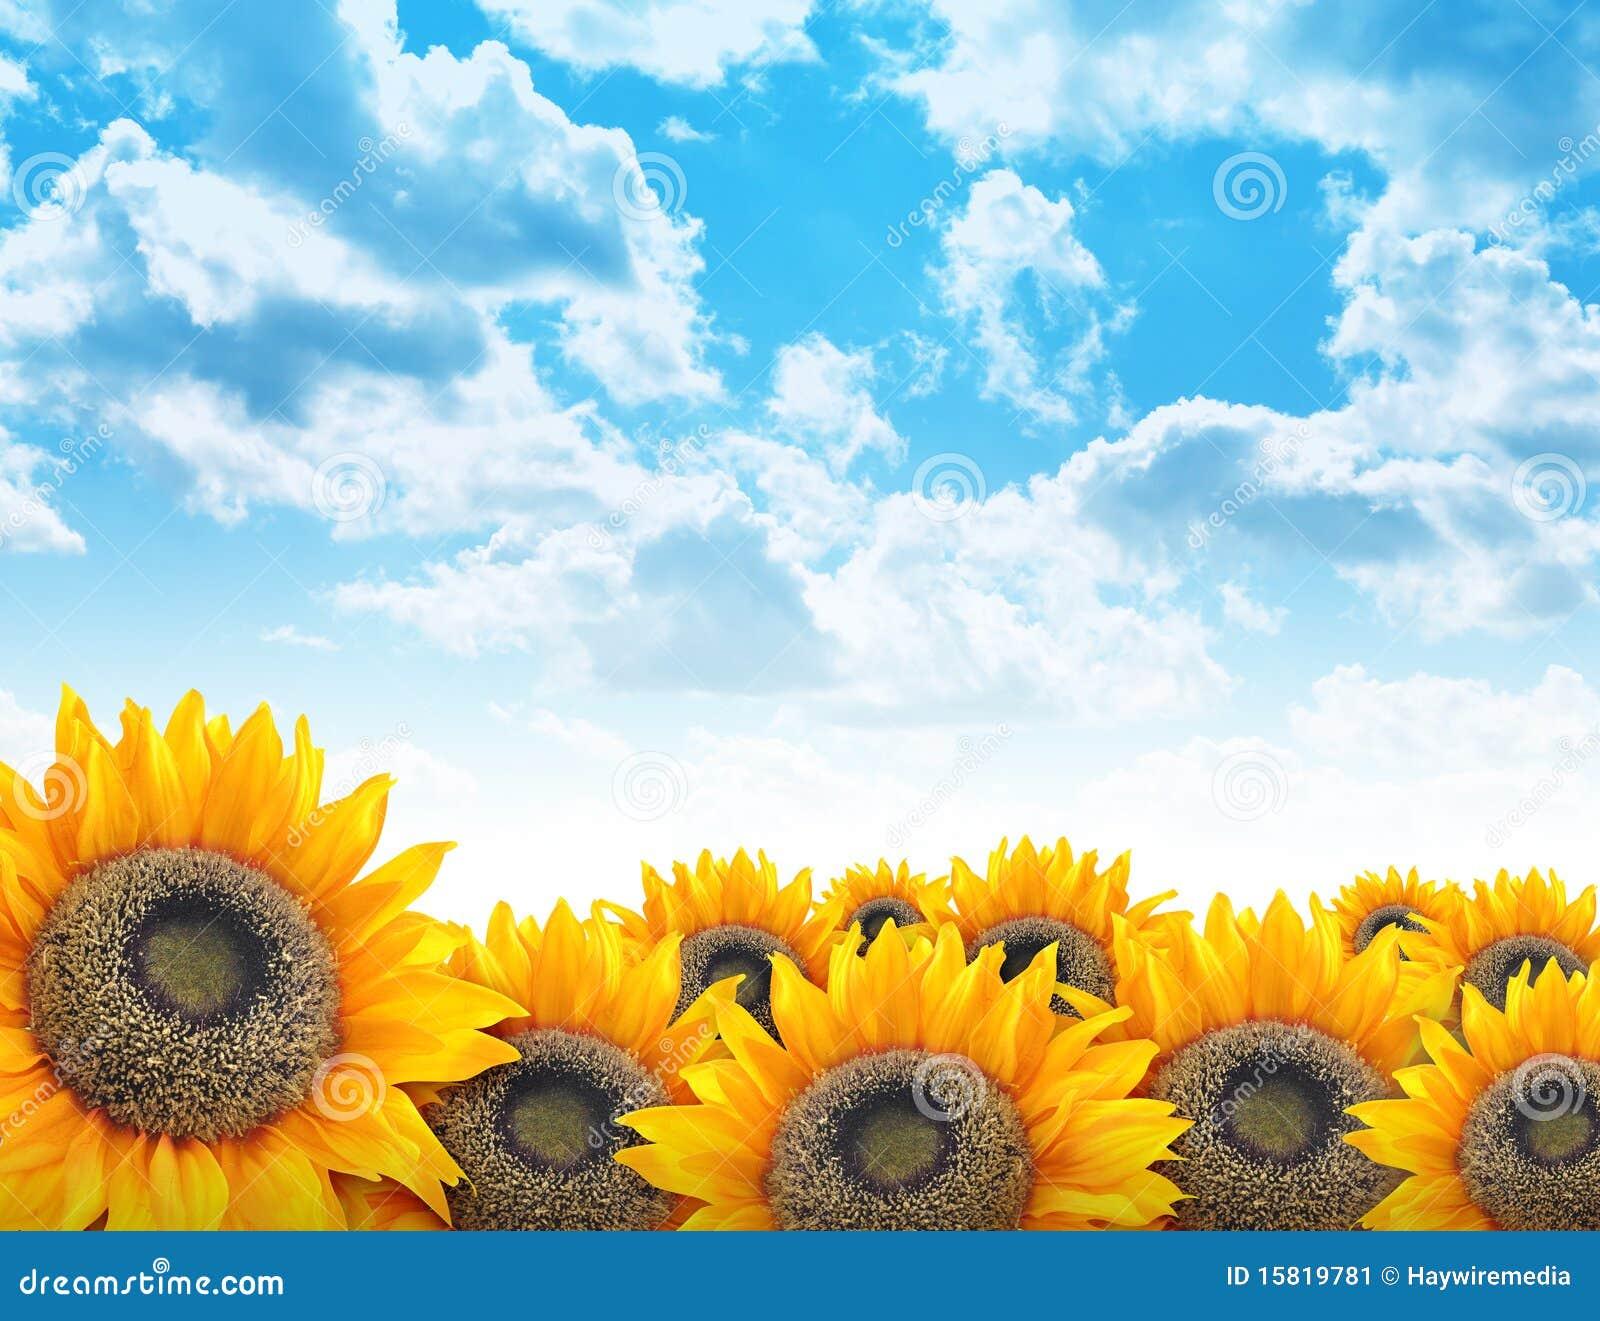 Bright Beautiful Flower Sunflower Background Stock Image ...